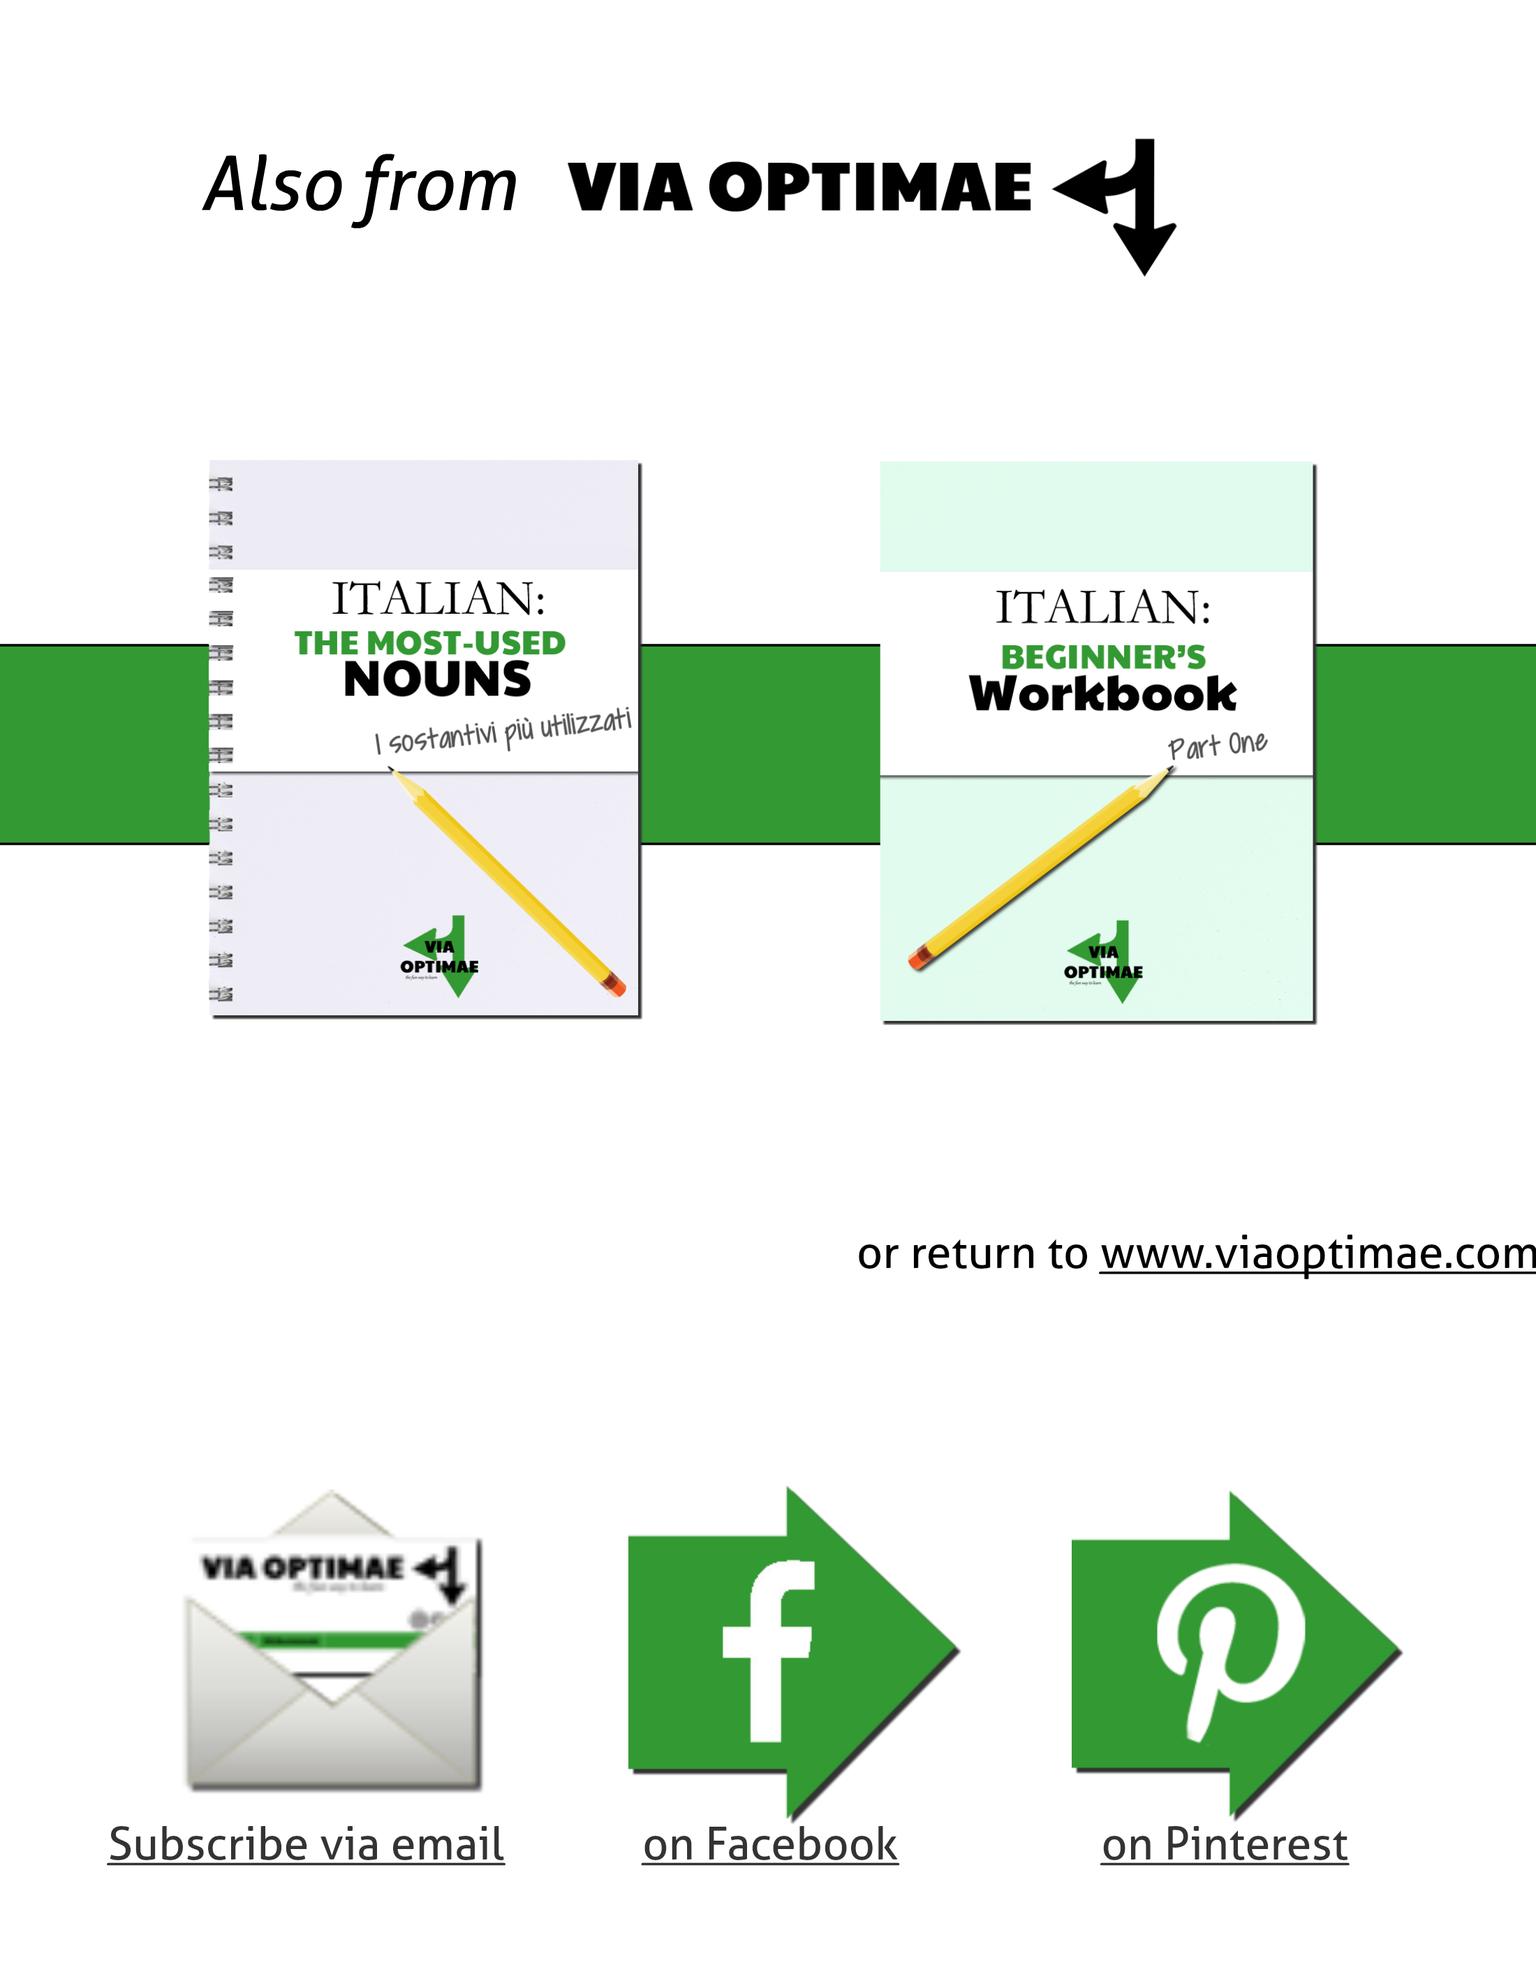 Italian Workbooks The Basics Workbook Part One